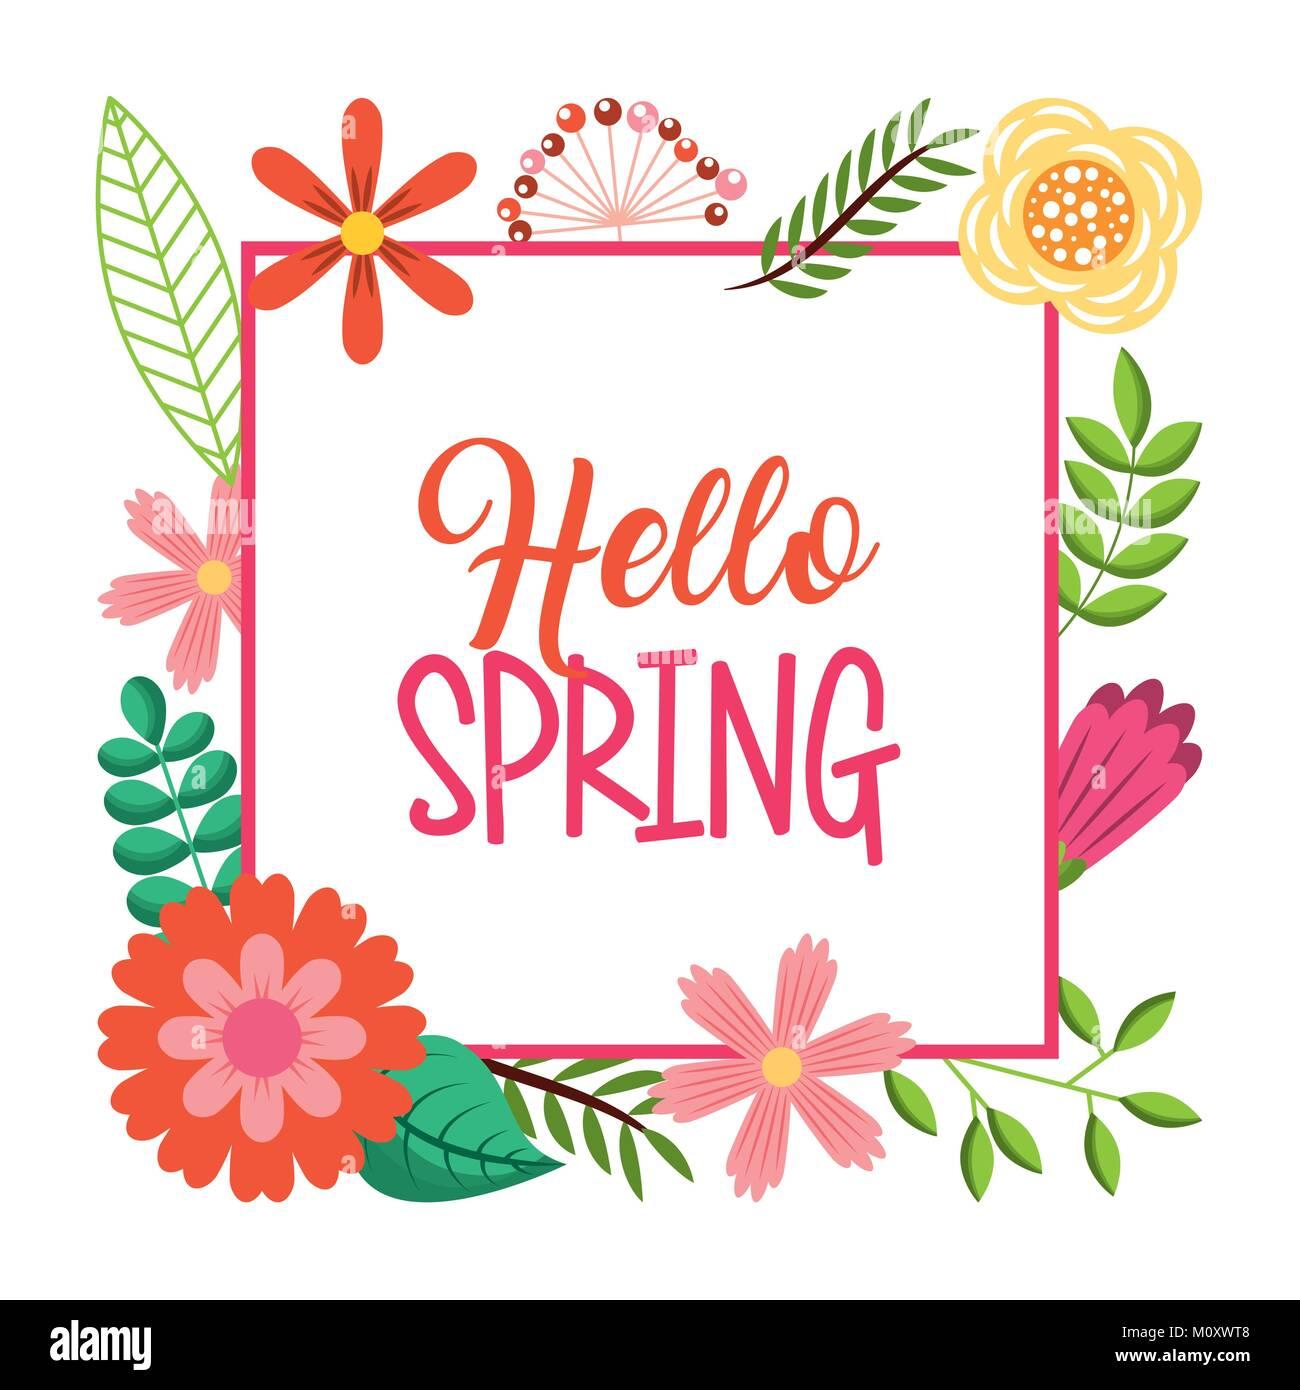 Hola tarjeta resorte rotulación decoración flores de marco de texto ...